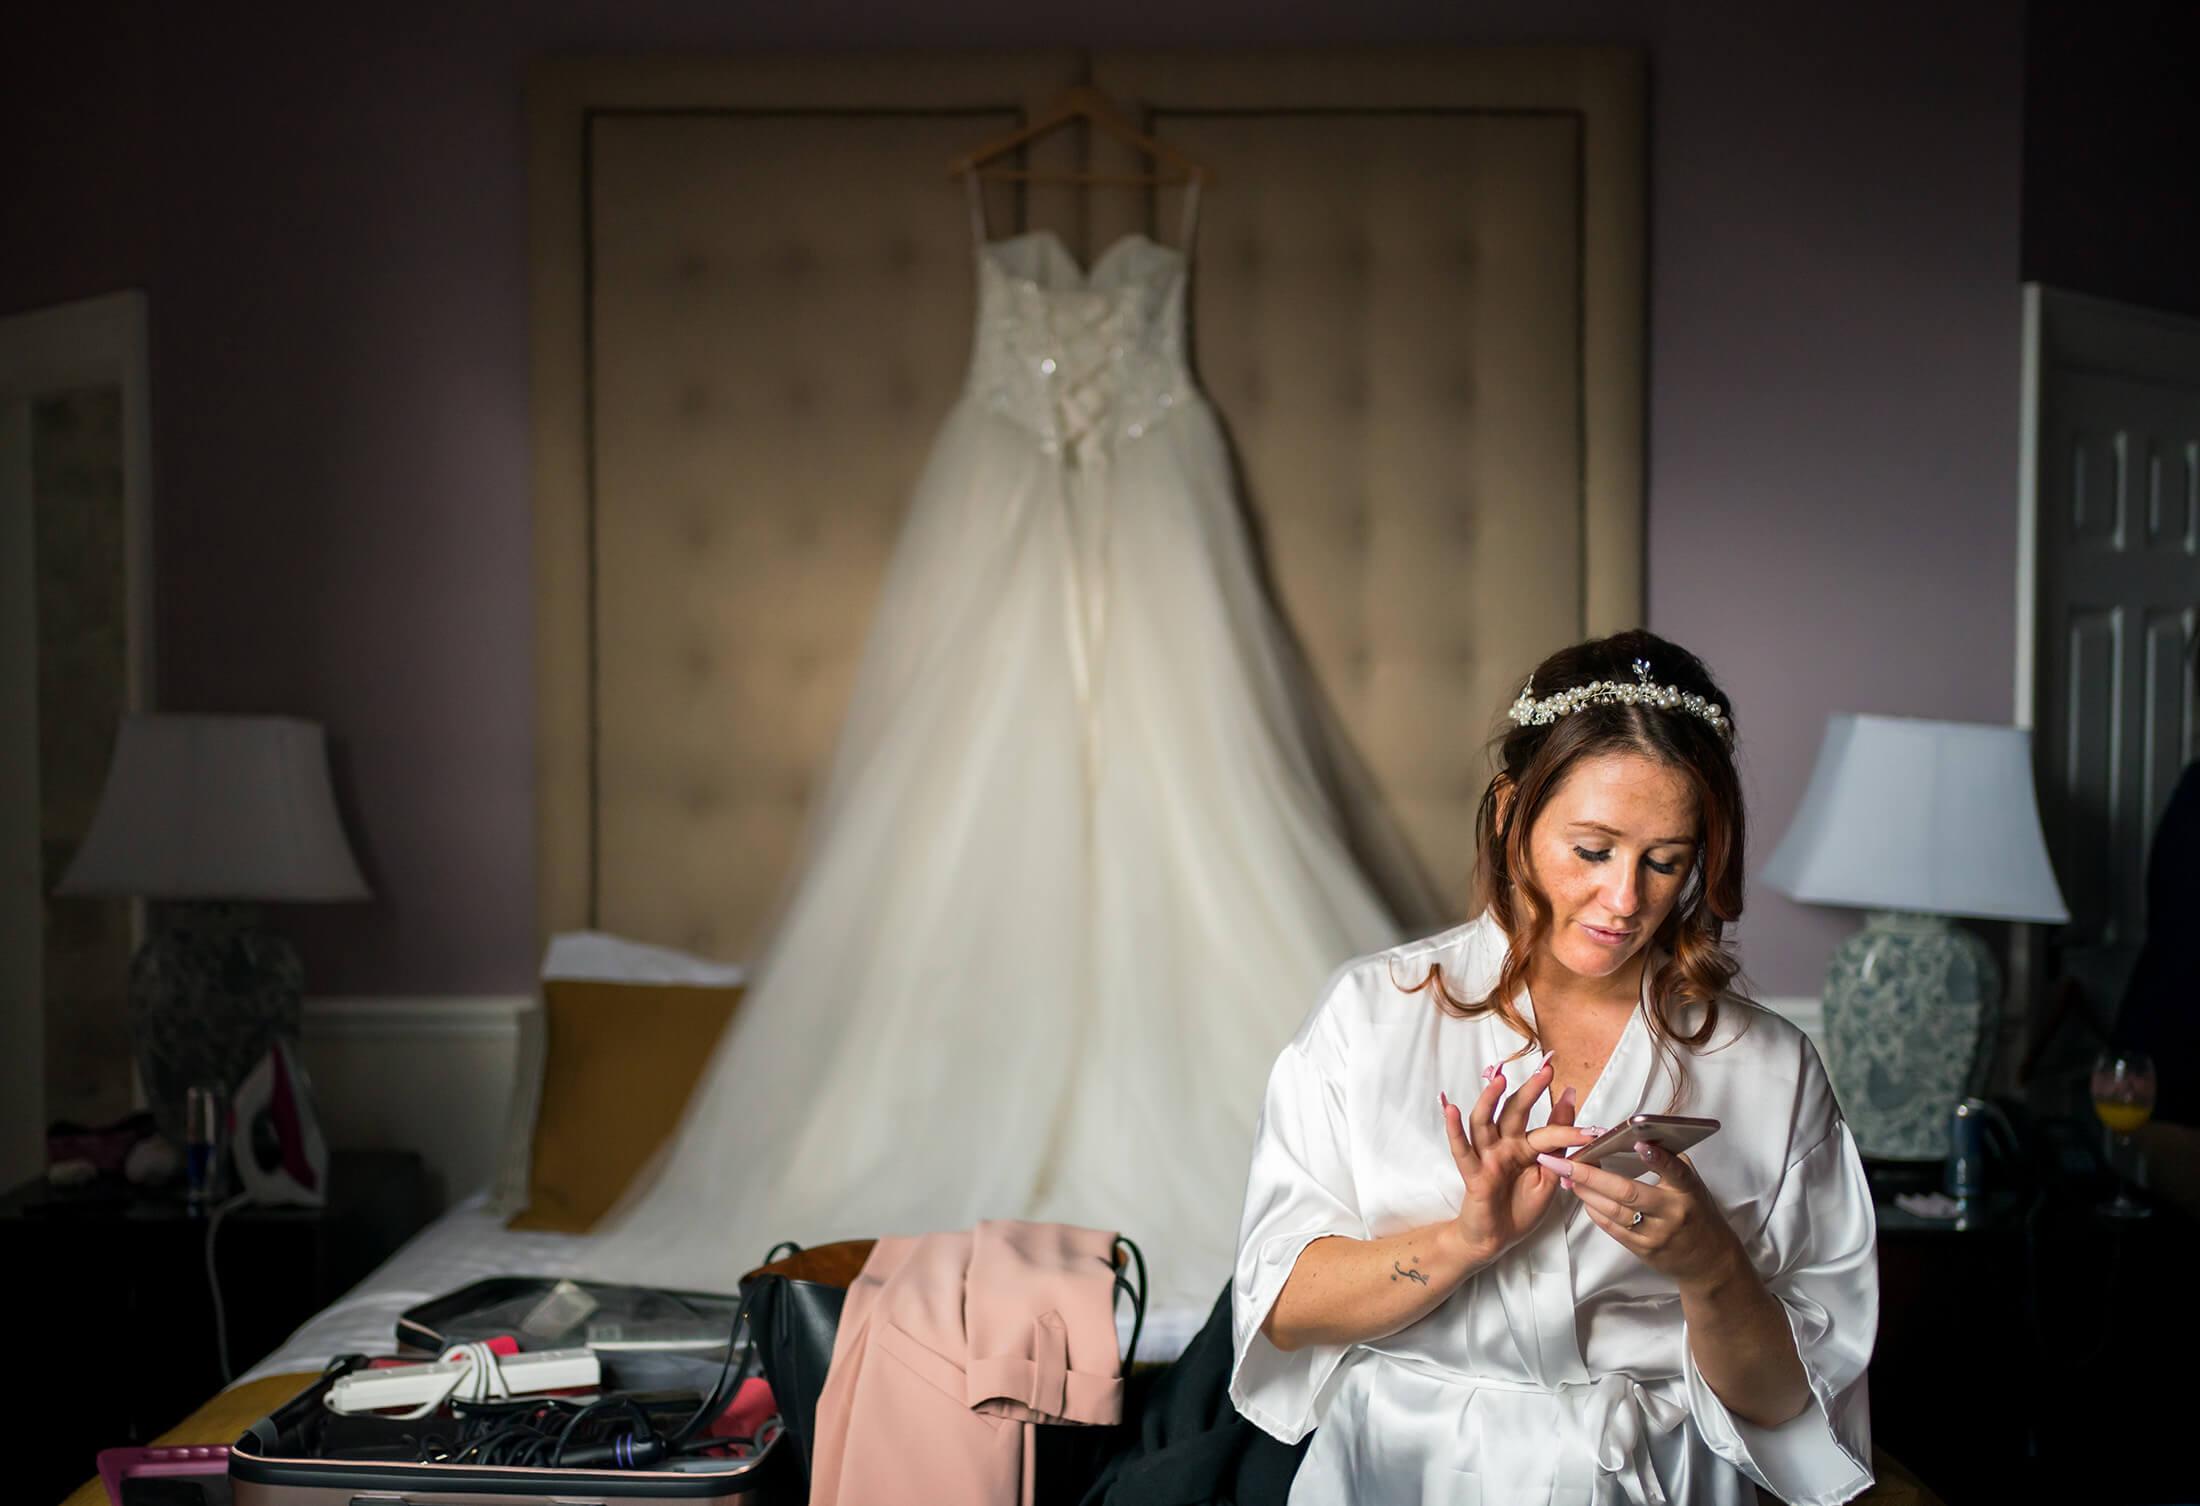 Hollin Hall Hotel Wedding Photographer - The bride texts her son